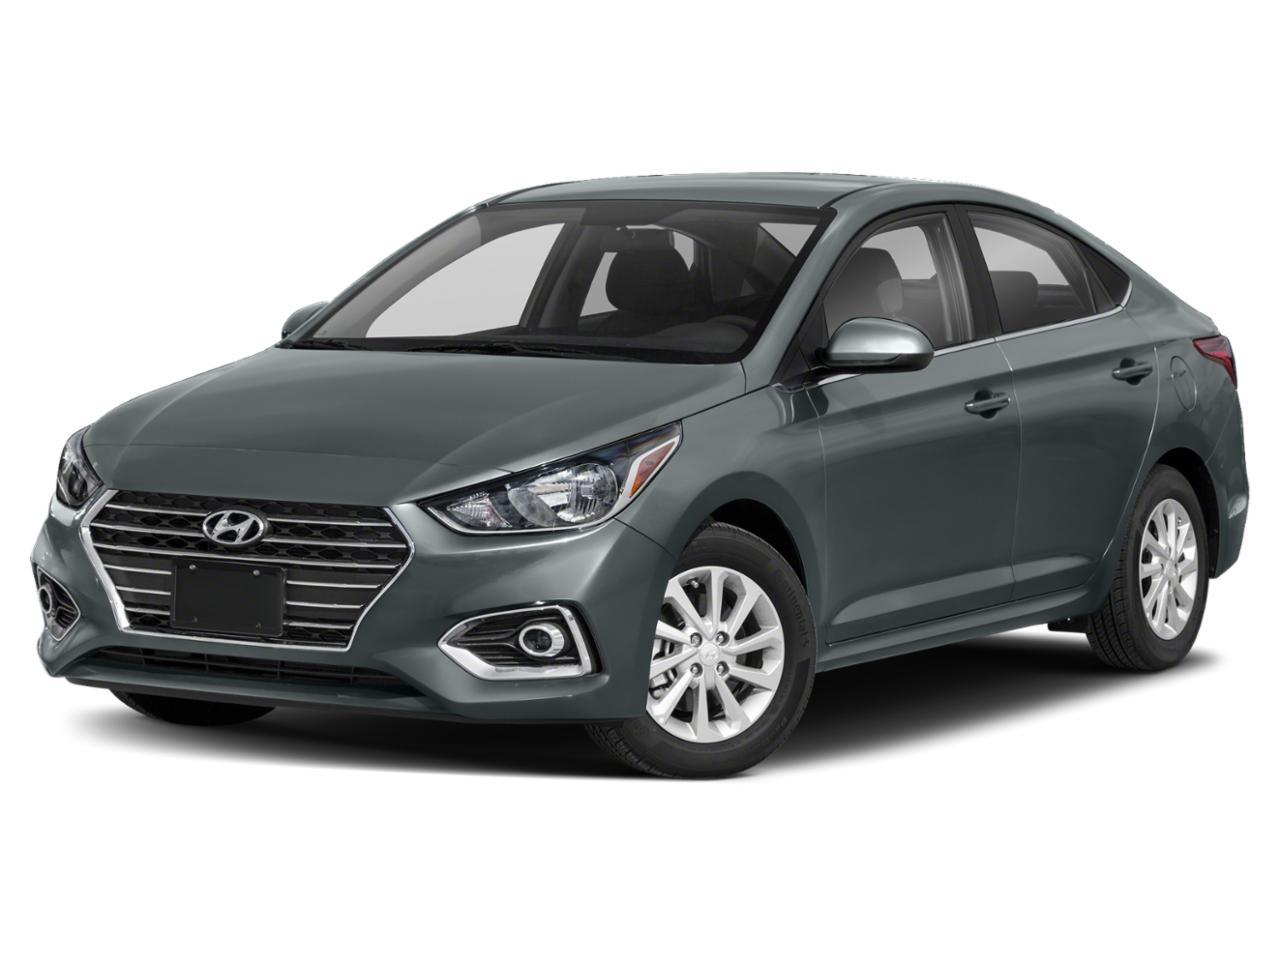 2021 Hyundai Accent Vehicle Photo in Appleton, WI 54913